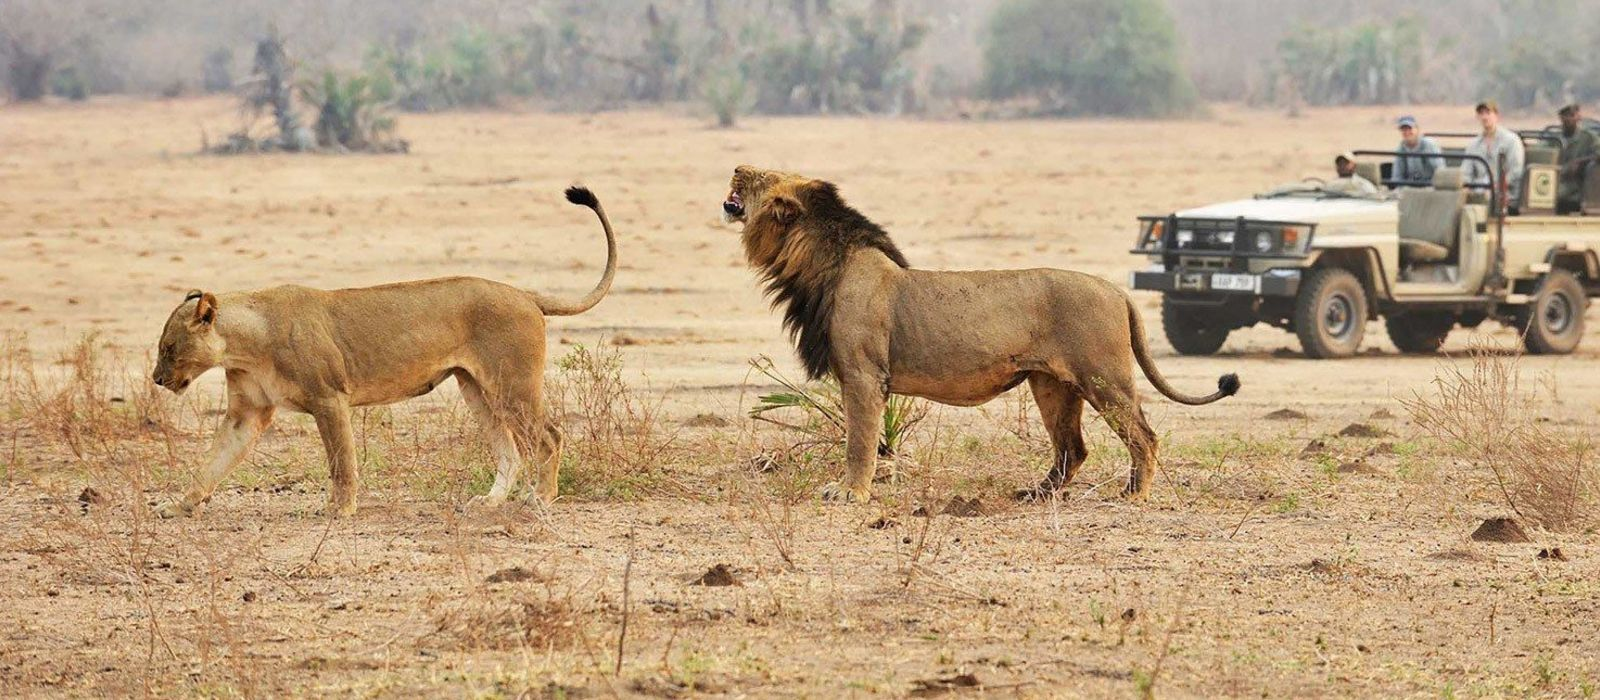 Tansania: Wahre Wildnis, unberührtes Juwel & Inselparadies Urlaub 2